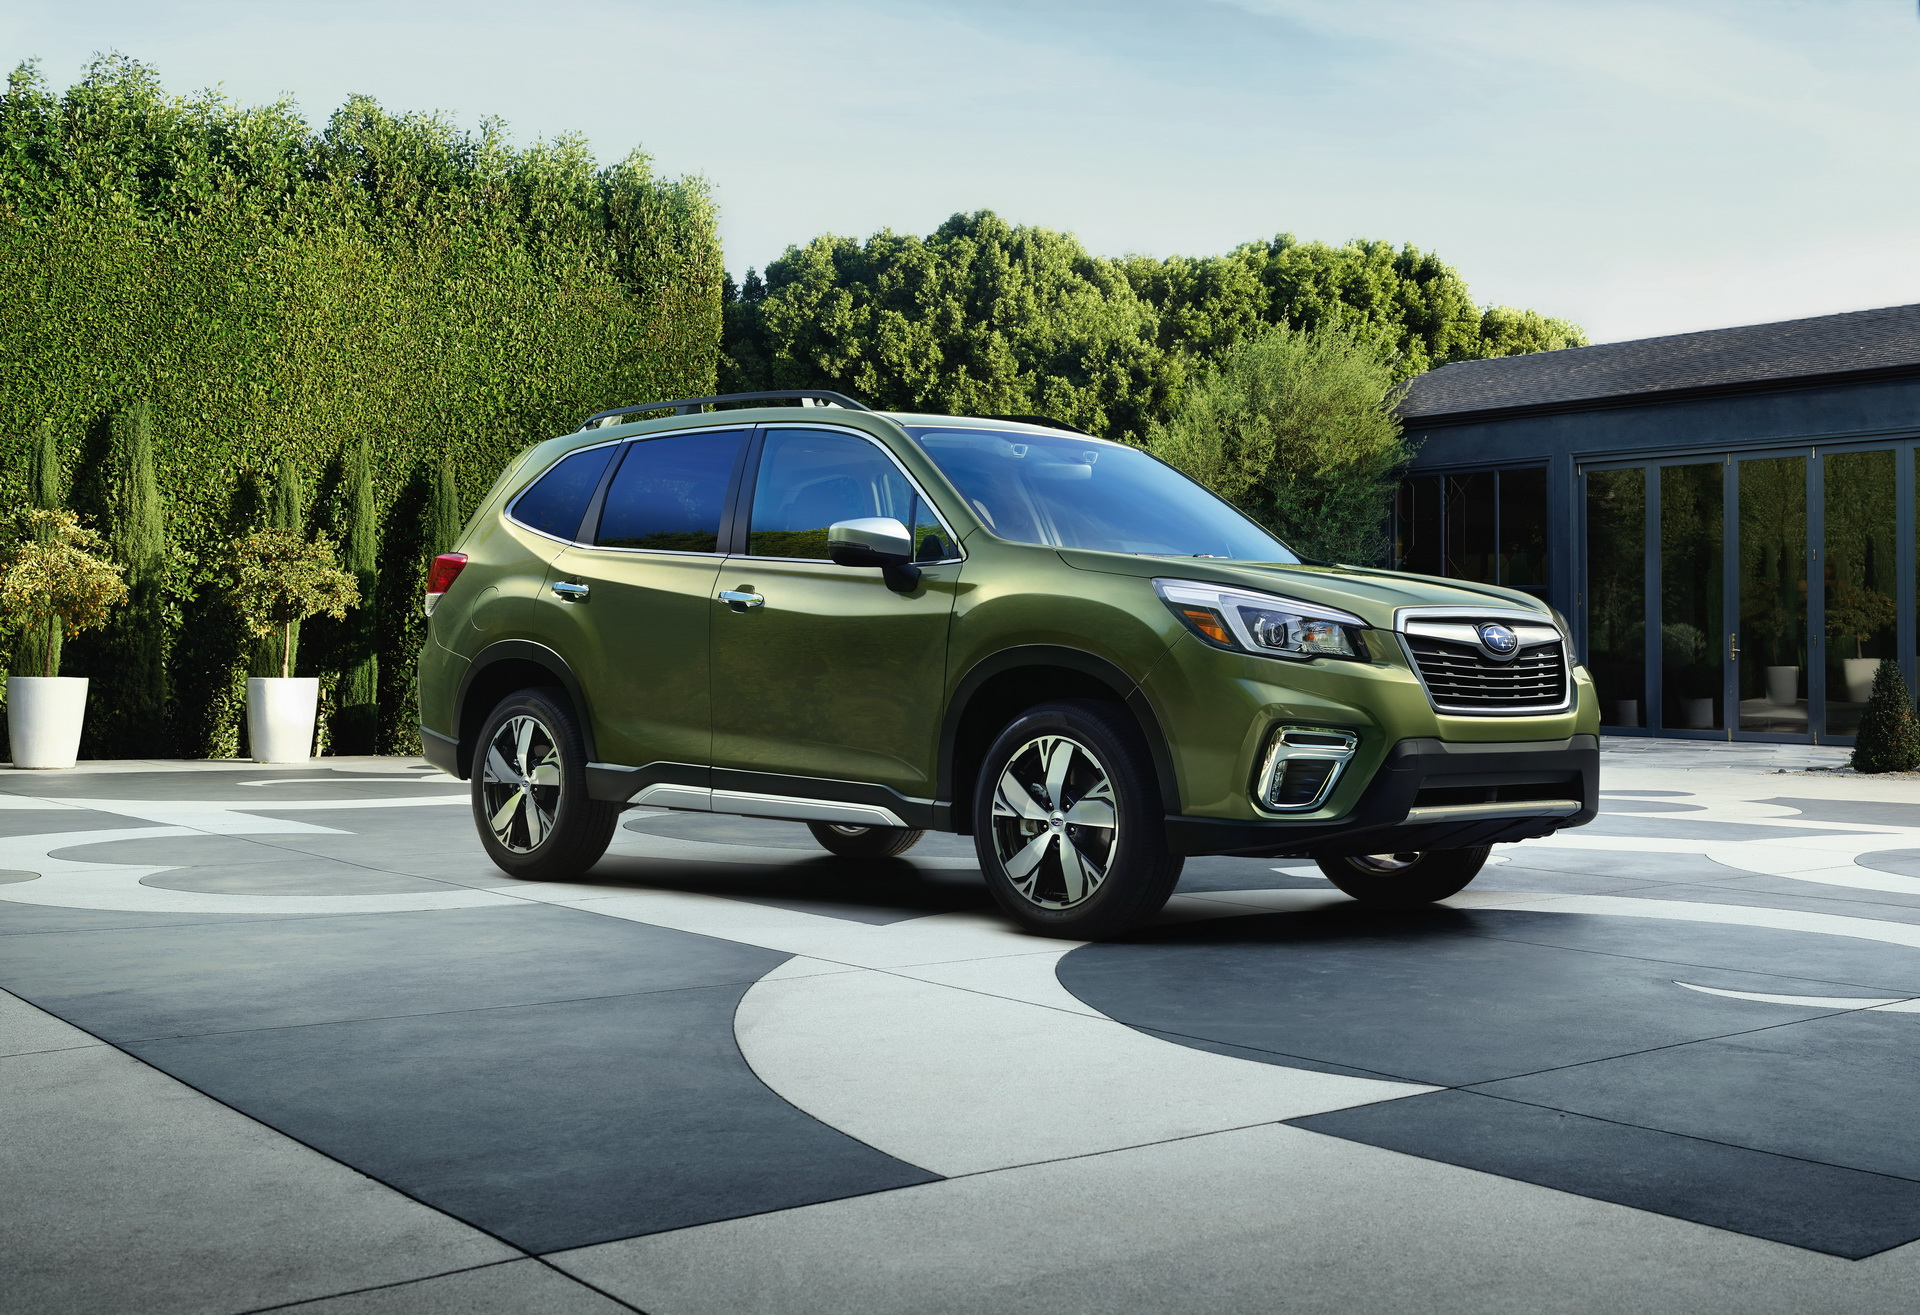 Subaru Remote Start In European Car Subaru Forester Owners Forum